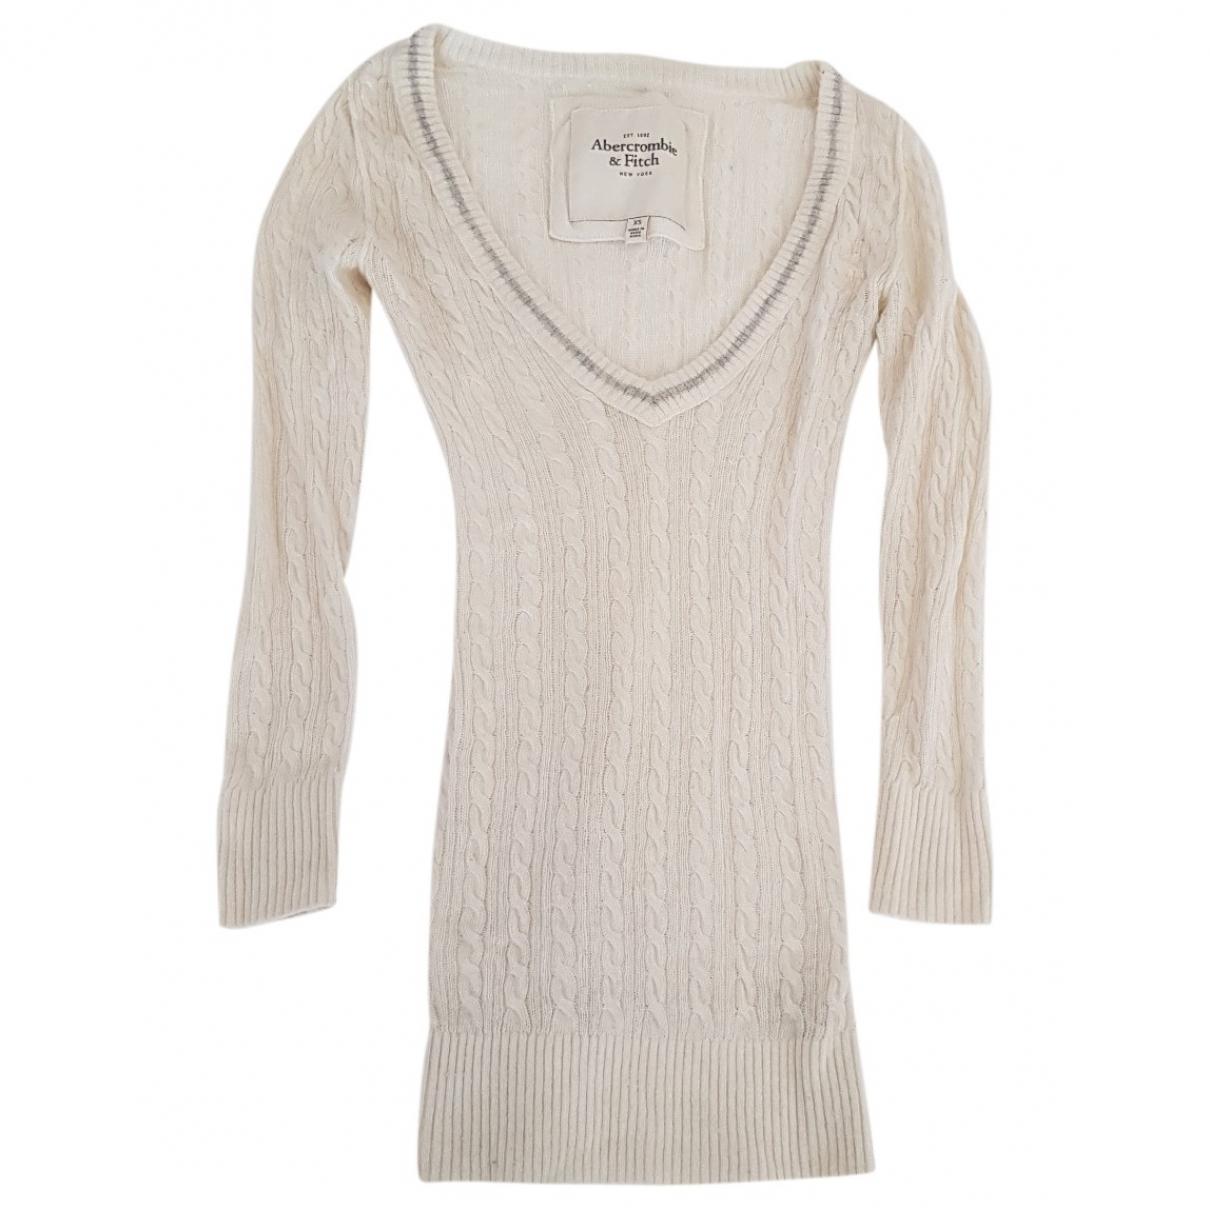 Abercrombie & Fitch \N White Knitwear for Women XS International